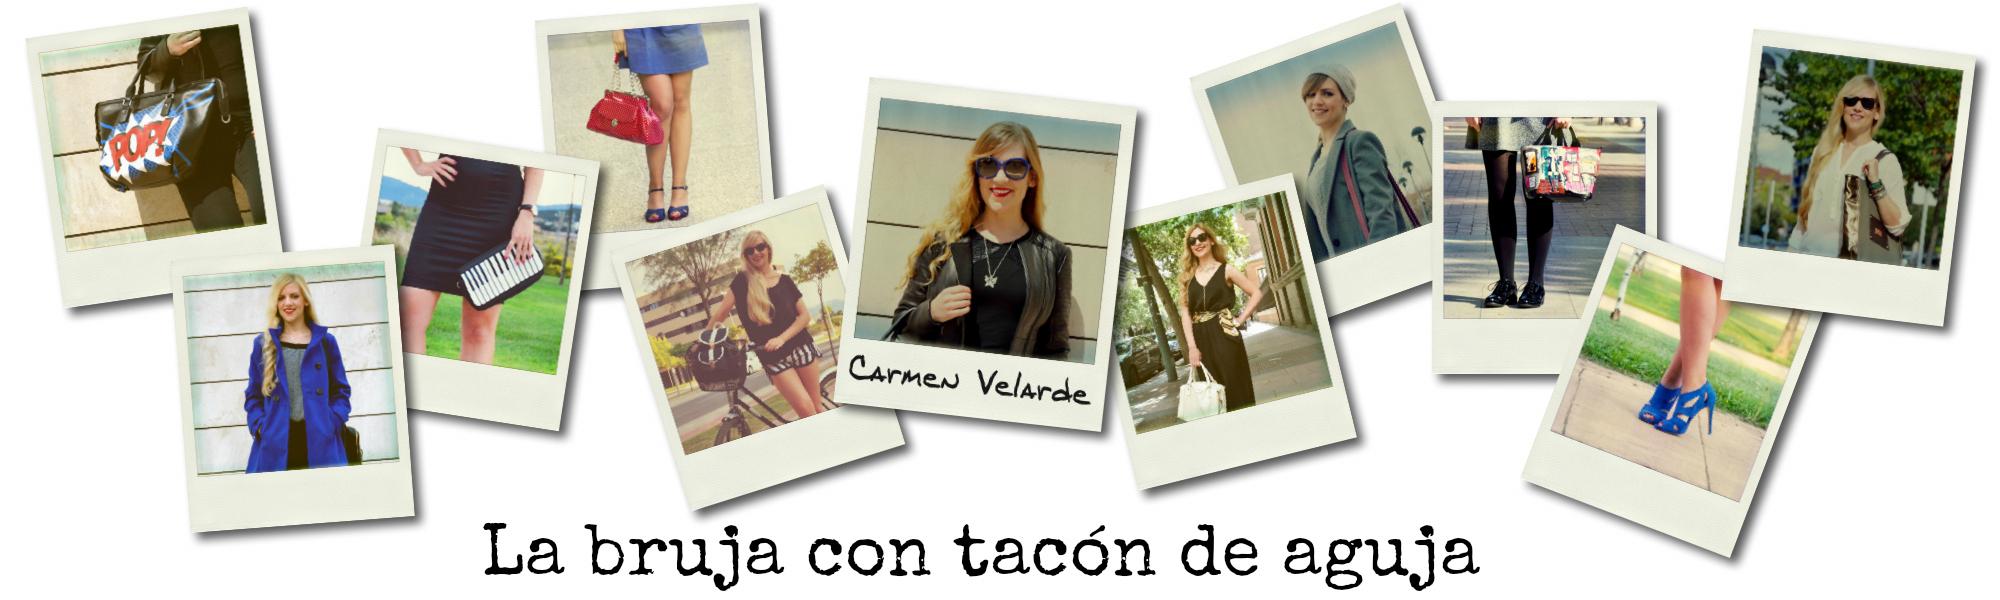 Blog de moda y belleza de Carmen Velarde